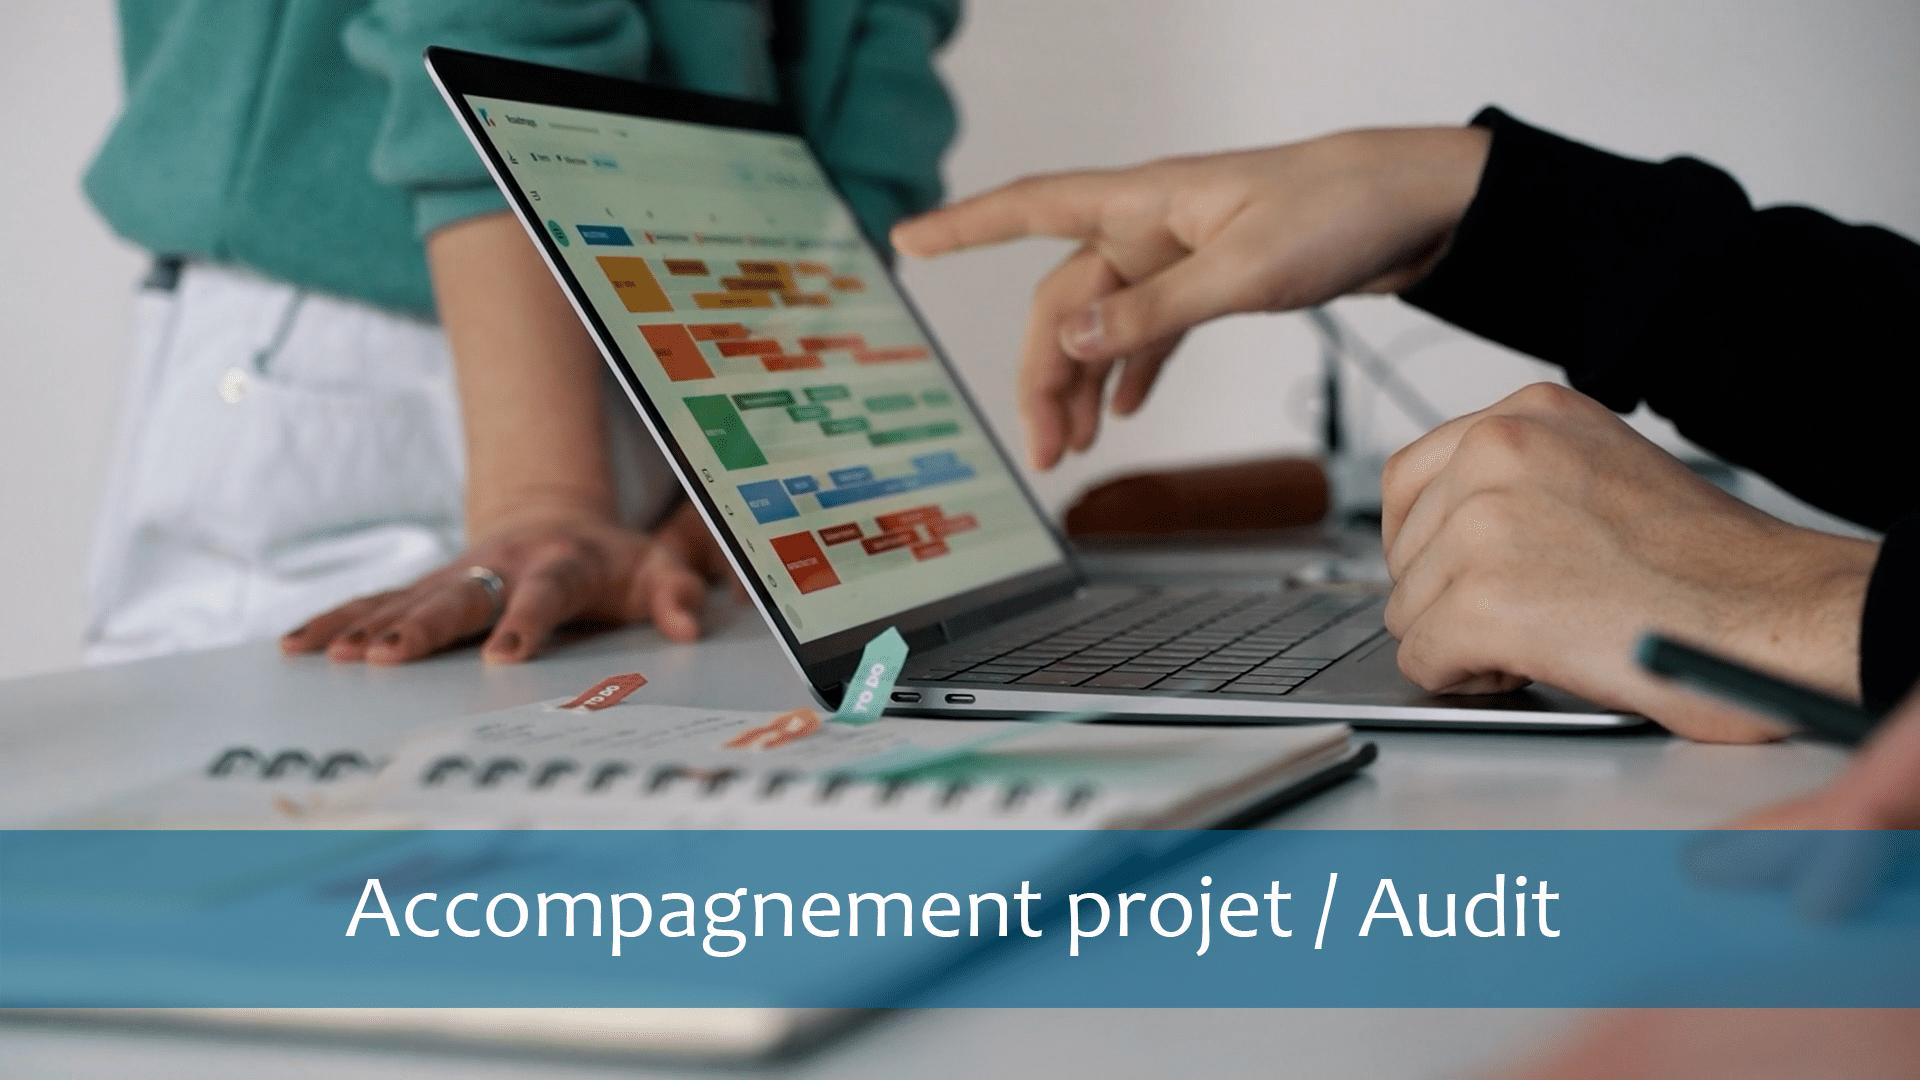 Accompagnement projet audit